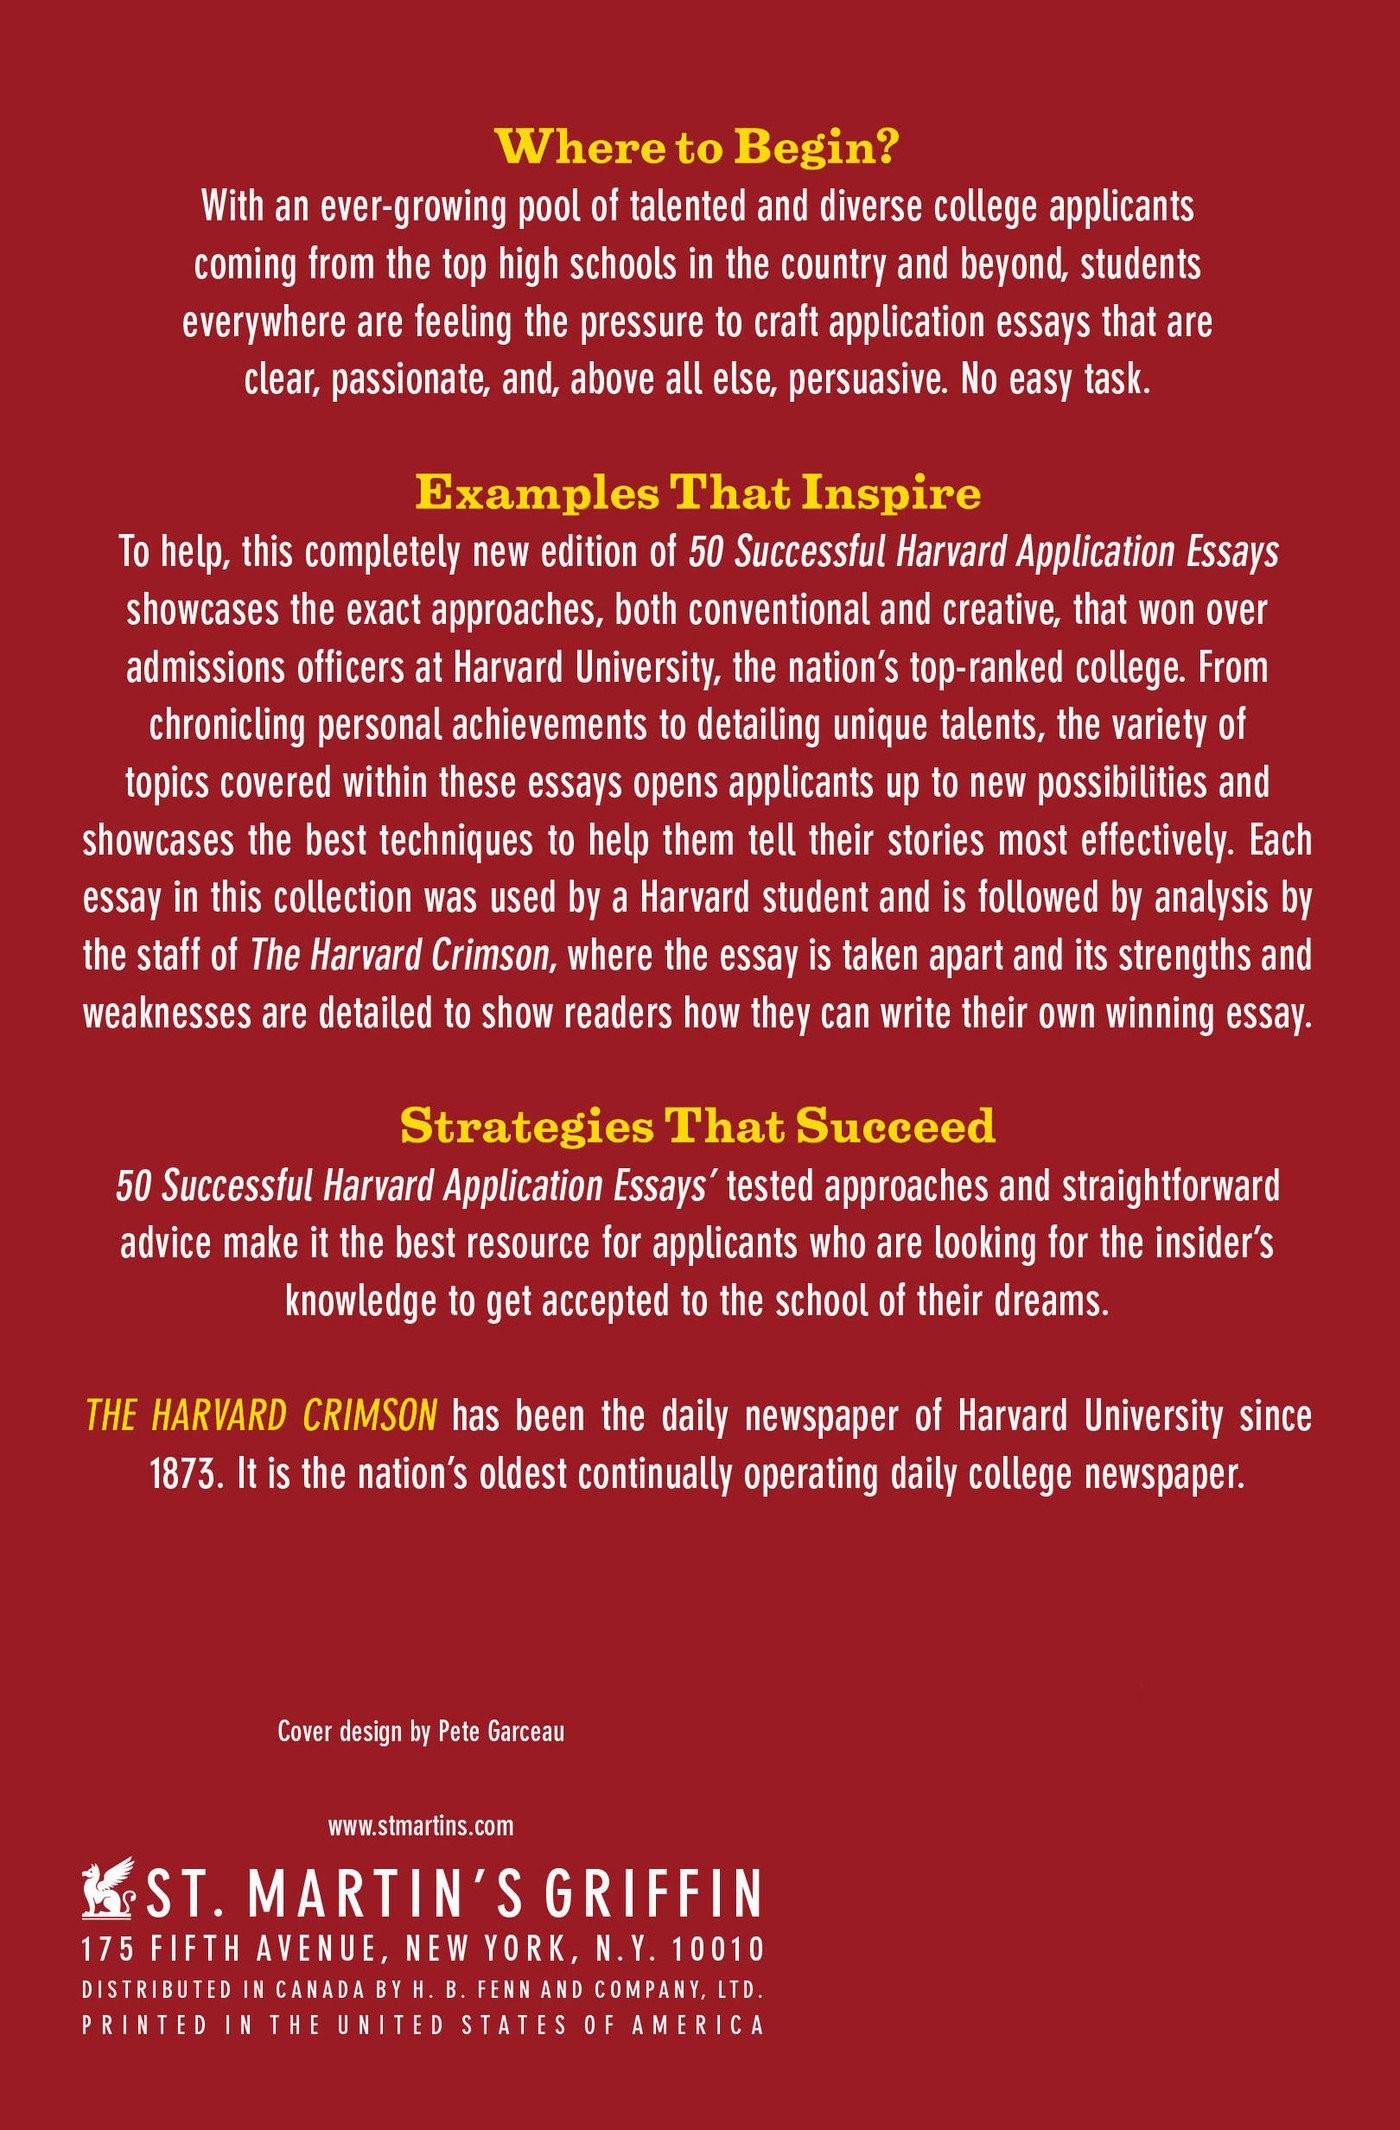 009 815kp6cfuhl Harvard Acceptance Essays Essay Frightening 50 Successful Application Pdf Free 2017 3rd Edition 1400